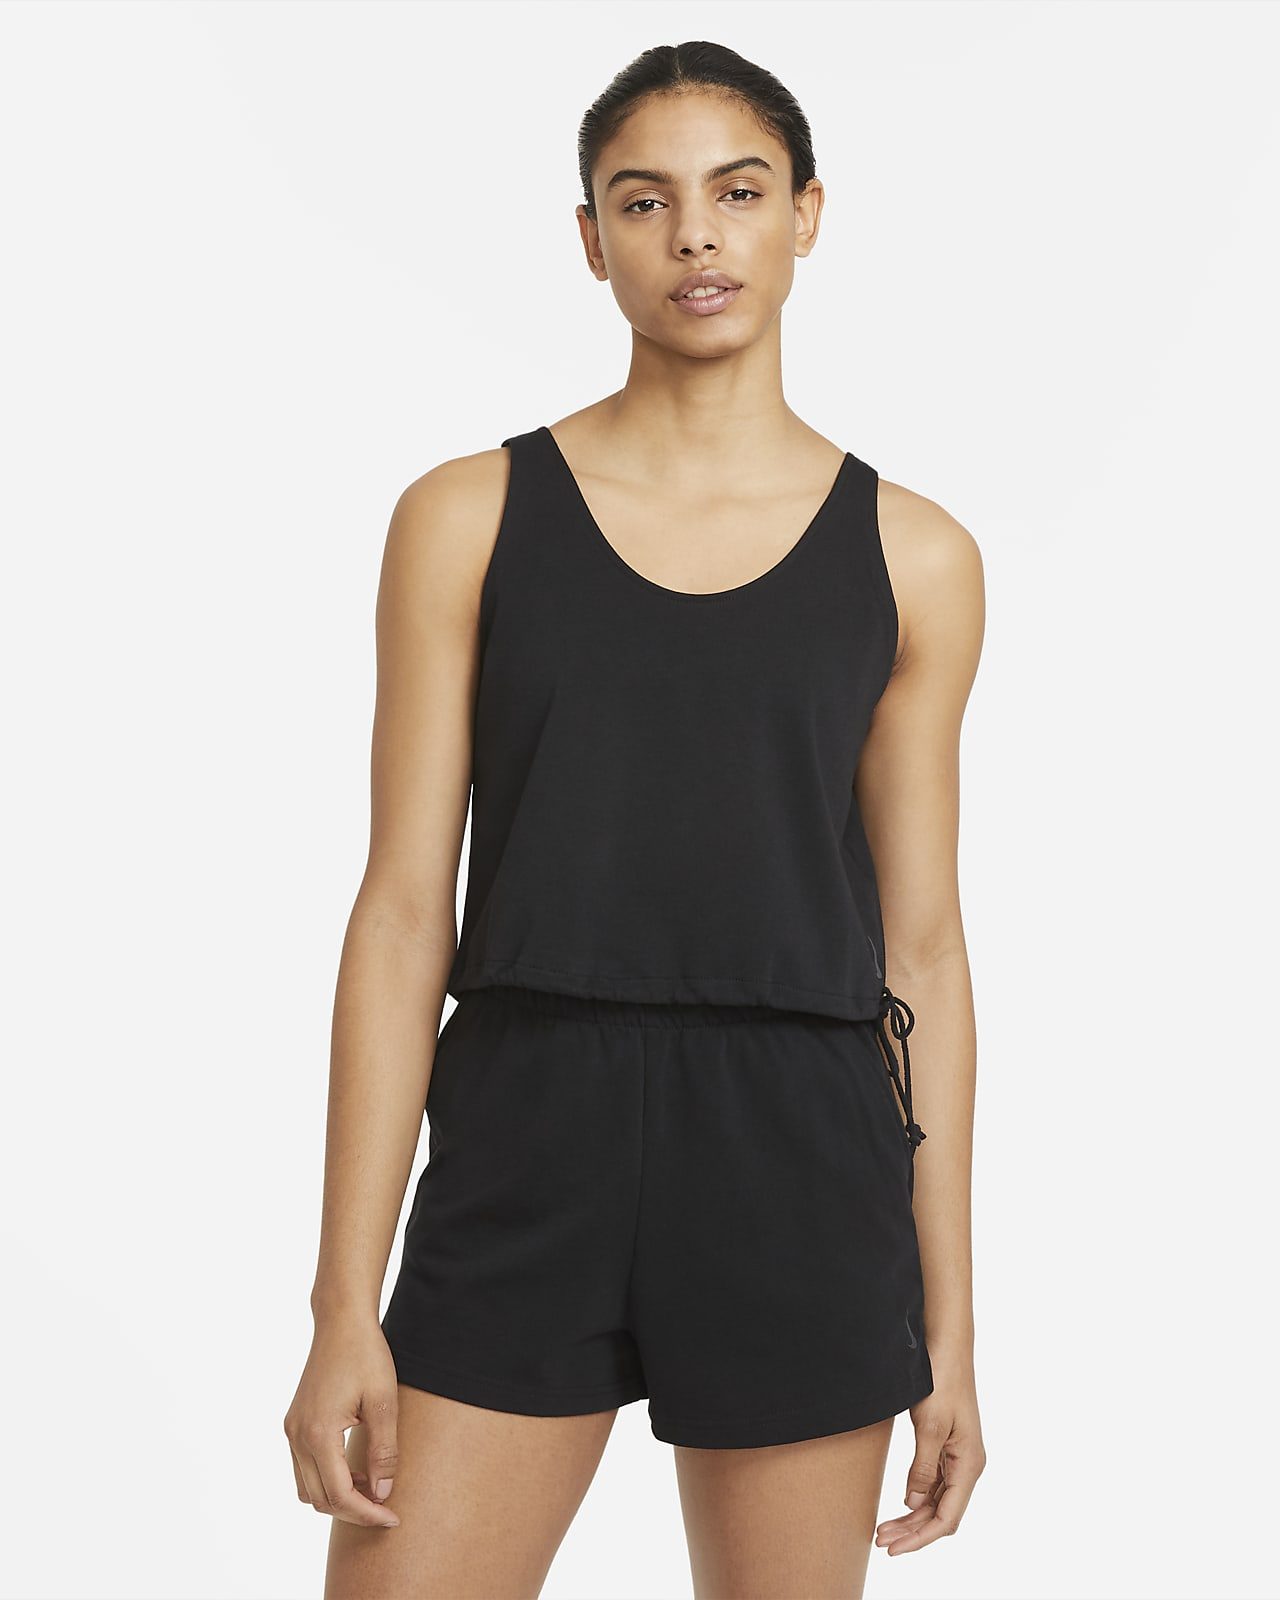 Camiseta de tirantes para mujer Nike Yoga